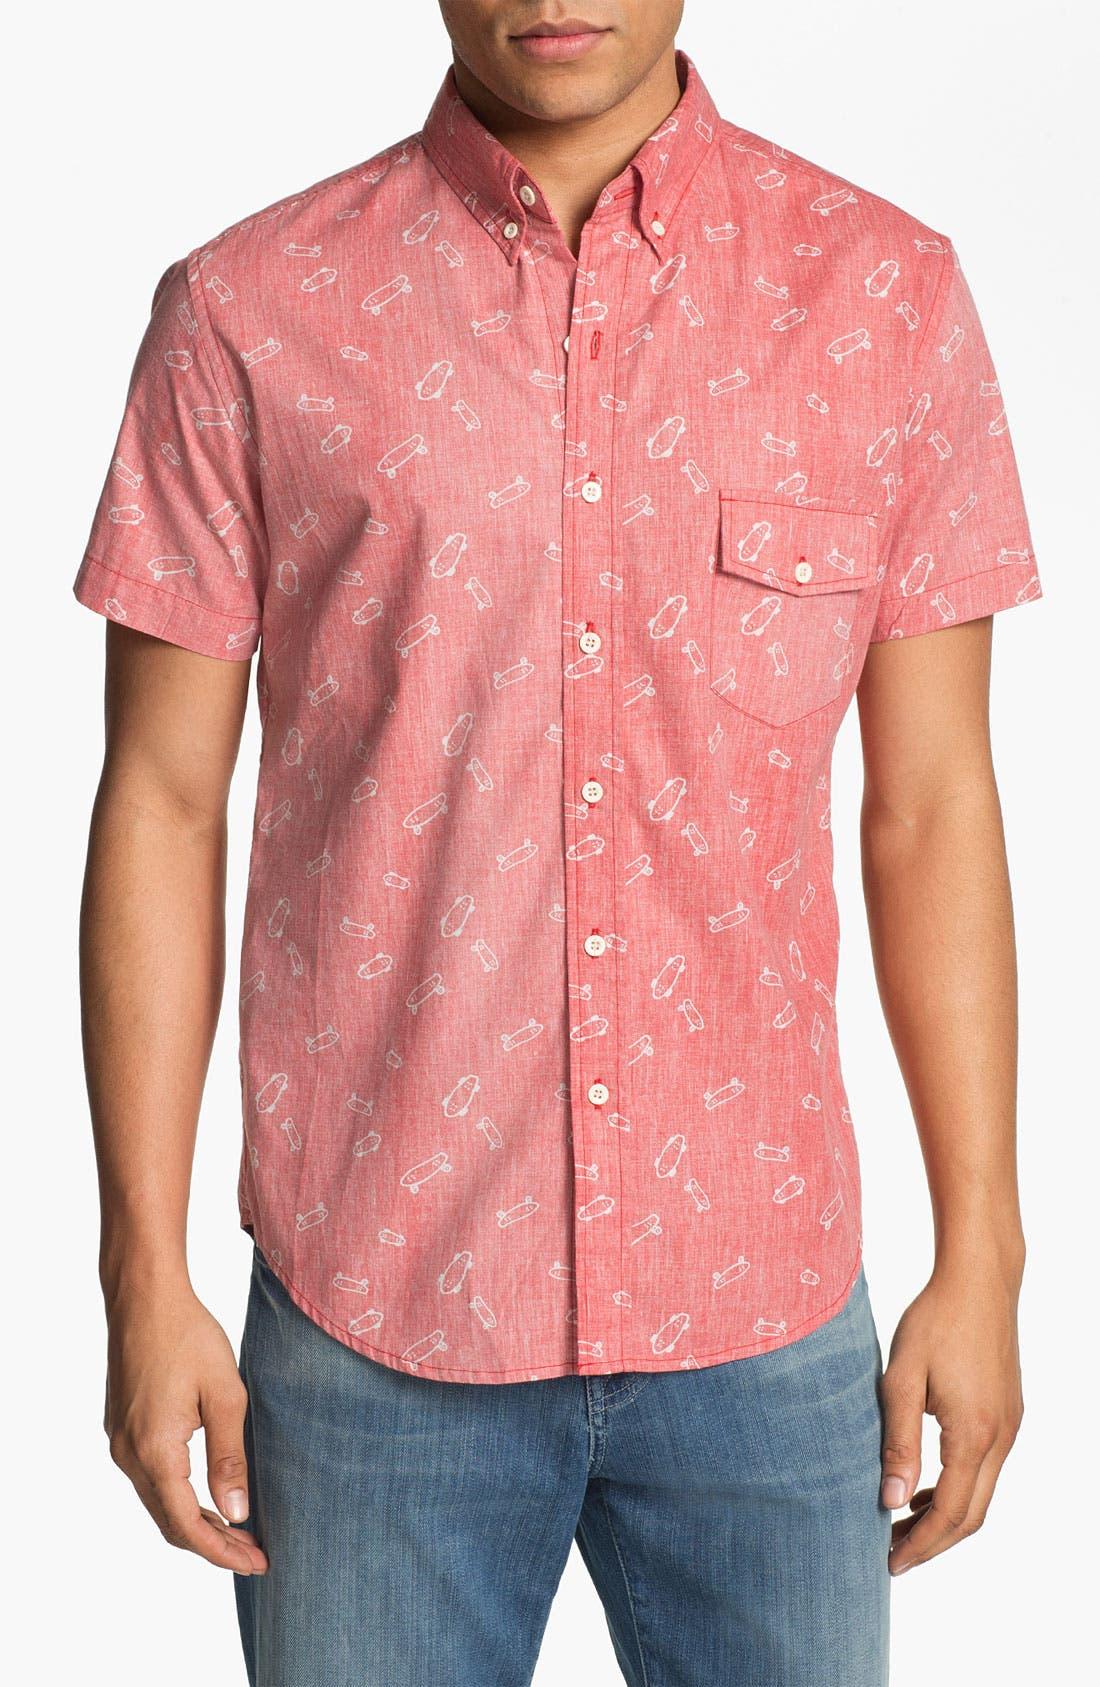 Main Image - Altru Skateboard Print Woven Shirt